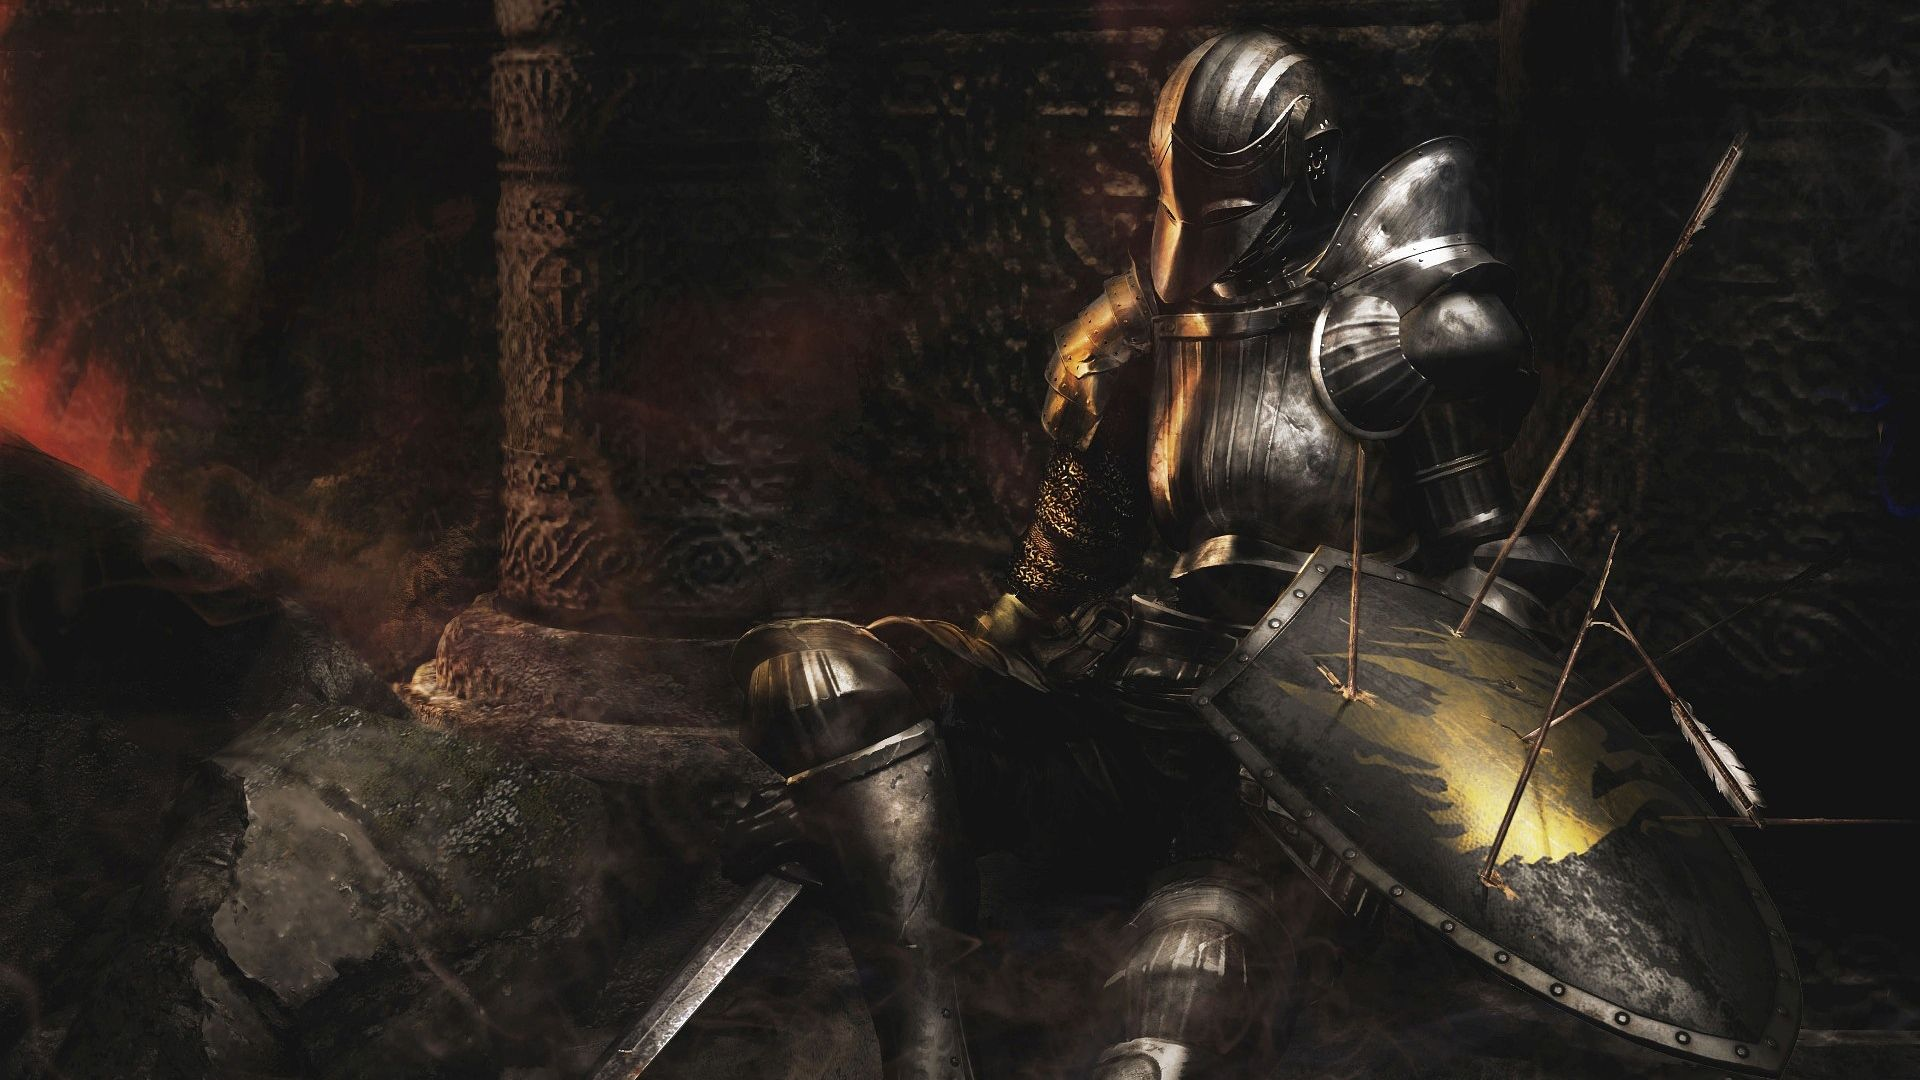 Dark Souls 3 Wallpaper 1080p Dark Souls Armor Dark Souls Dark